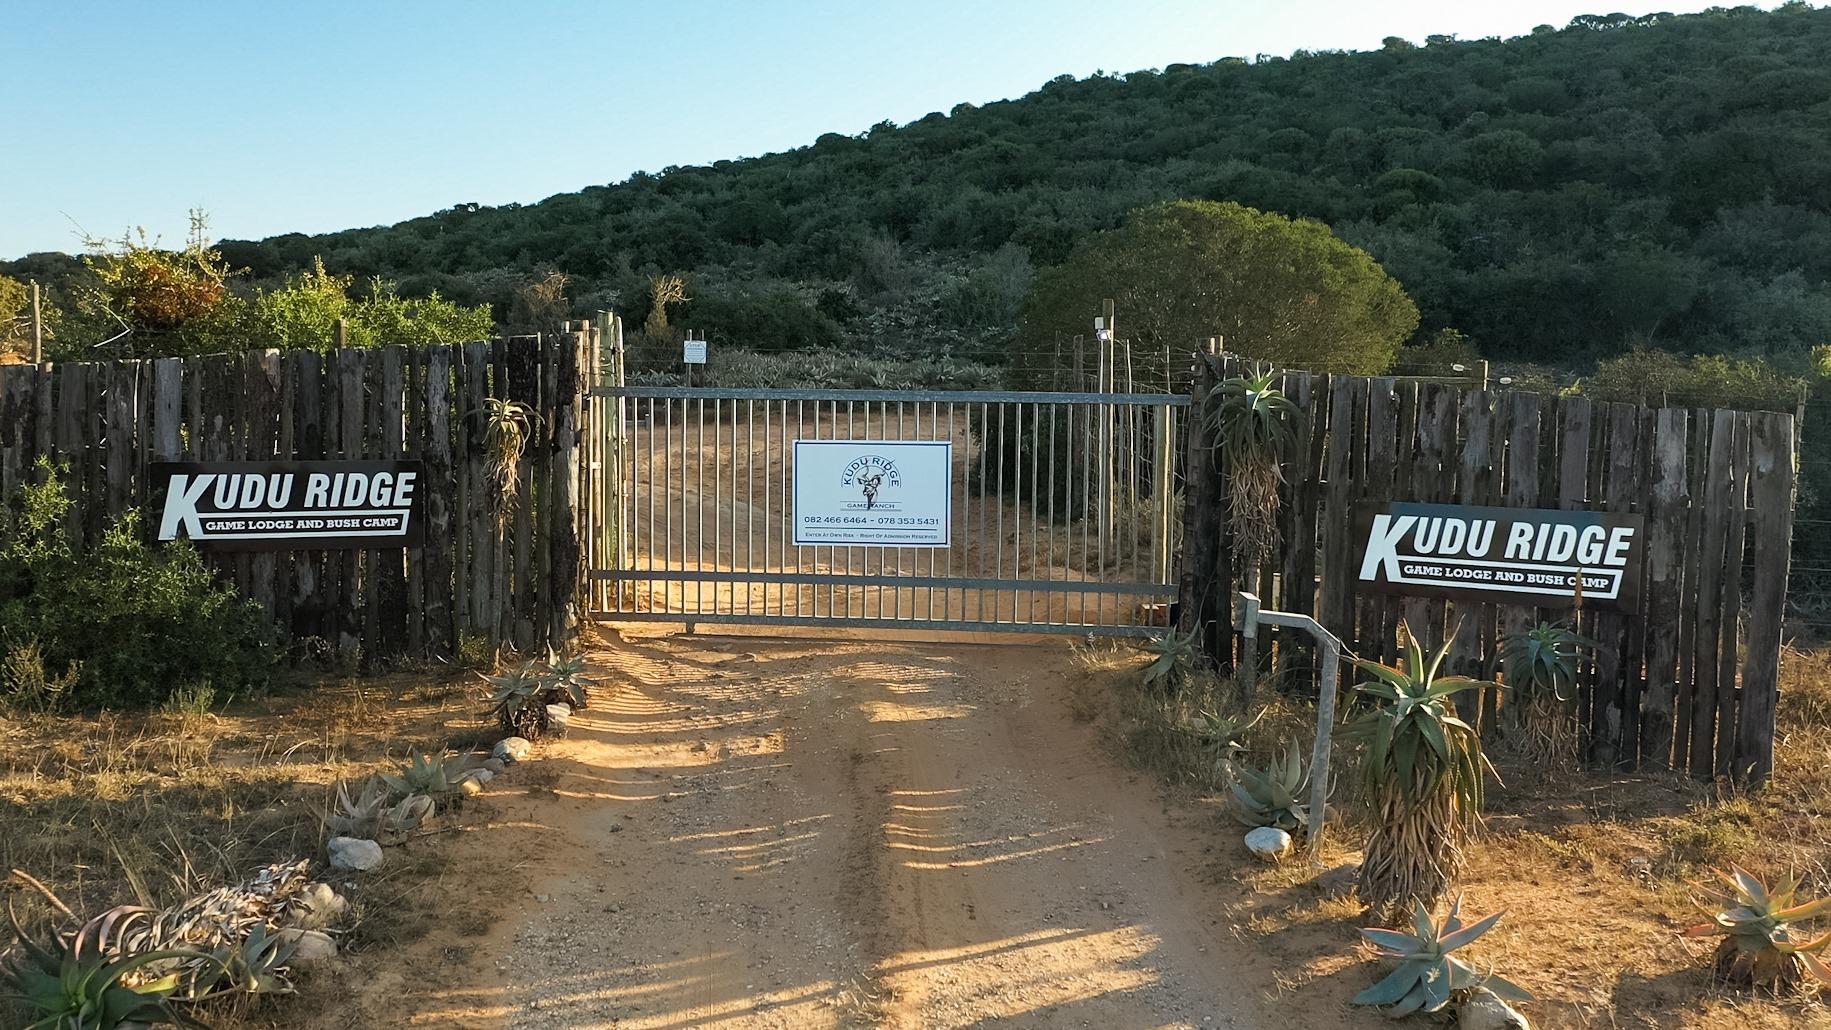 Kudu-Ridge-Entrance